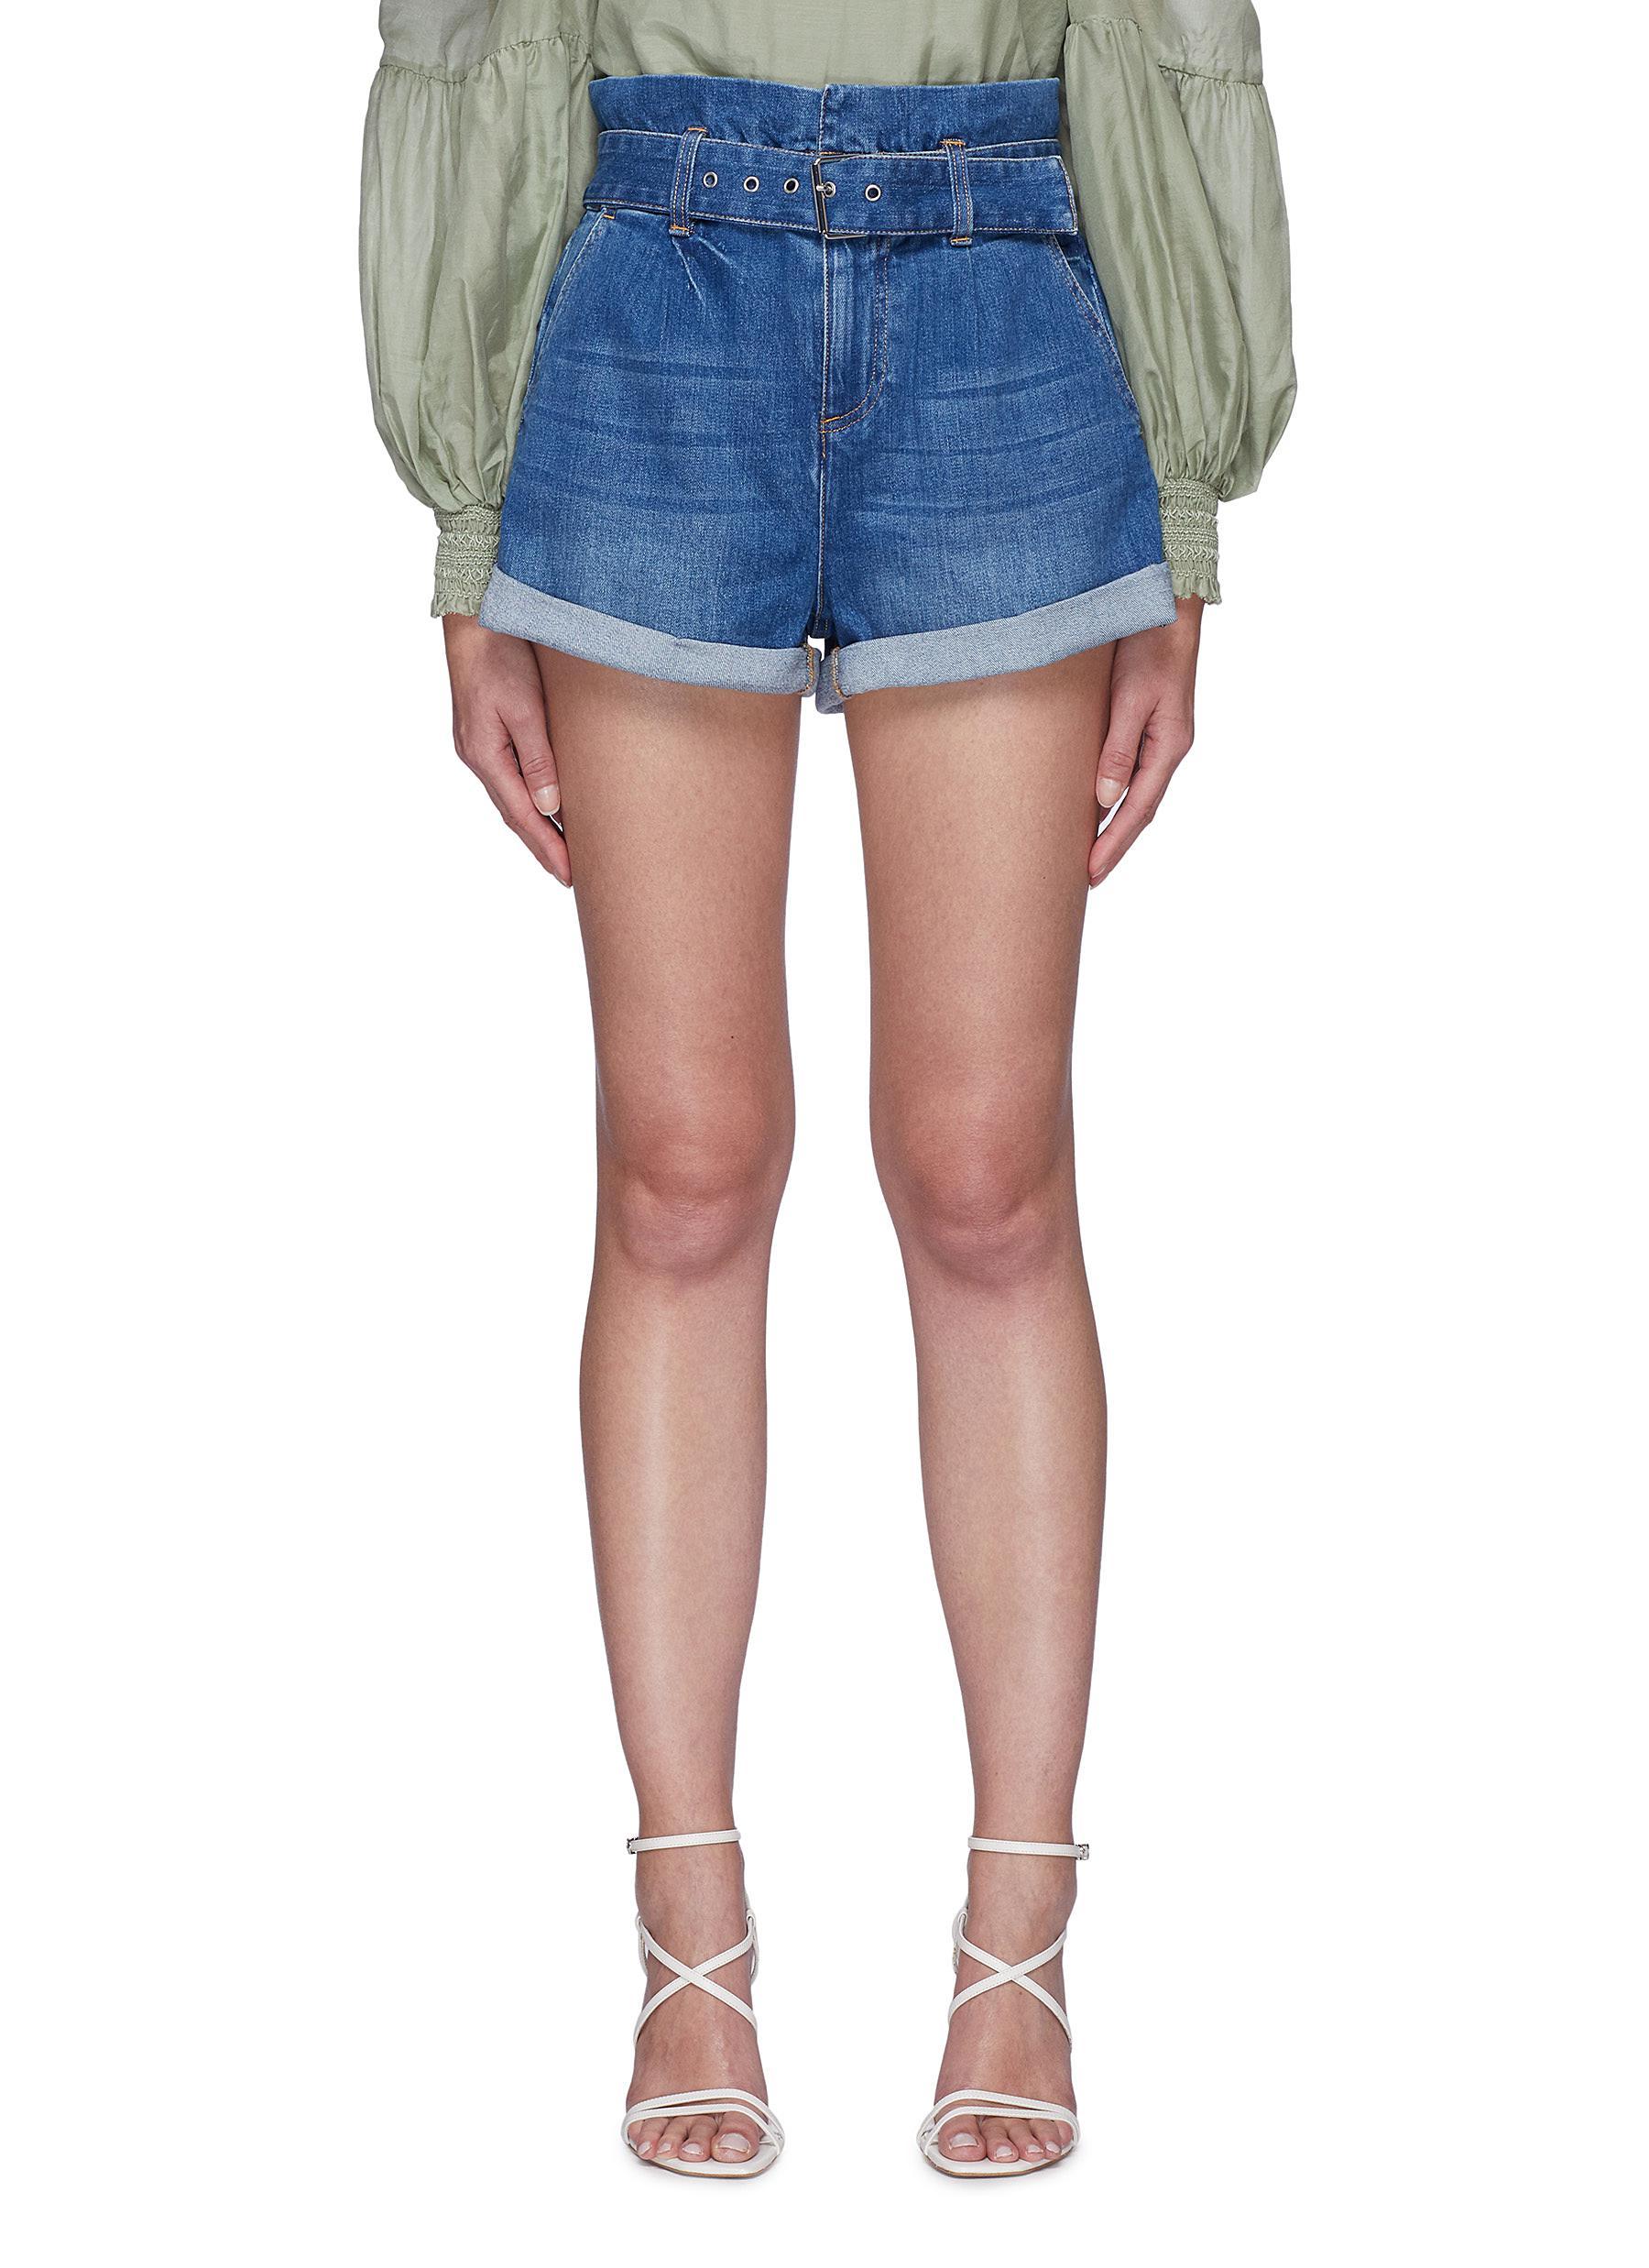 Rosemary' belted paperbag denim shorts - ALICE + OLIVIA - Modalova